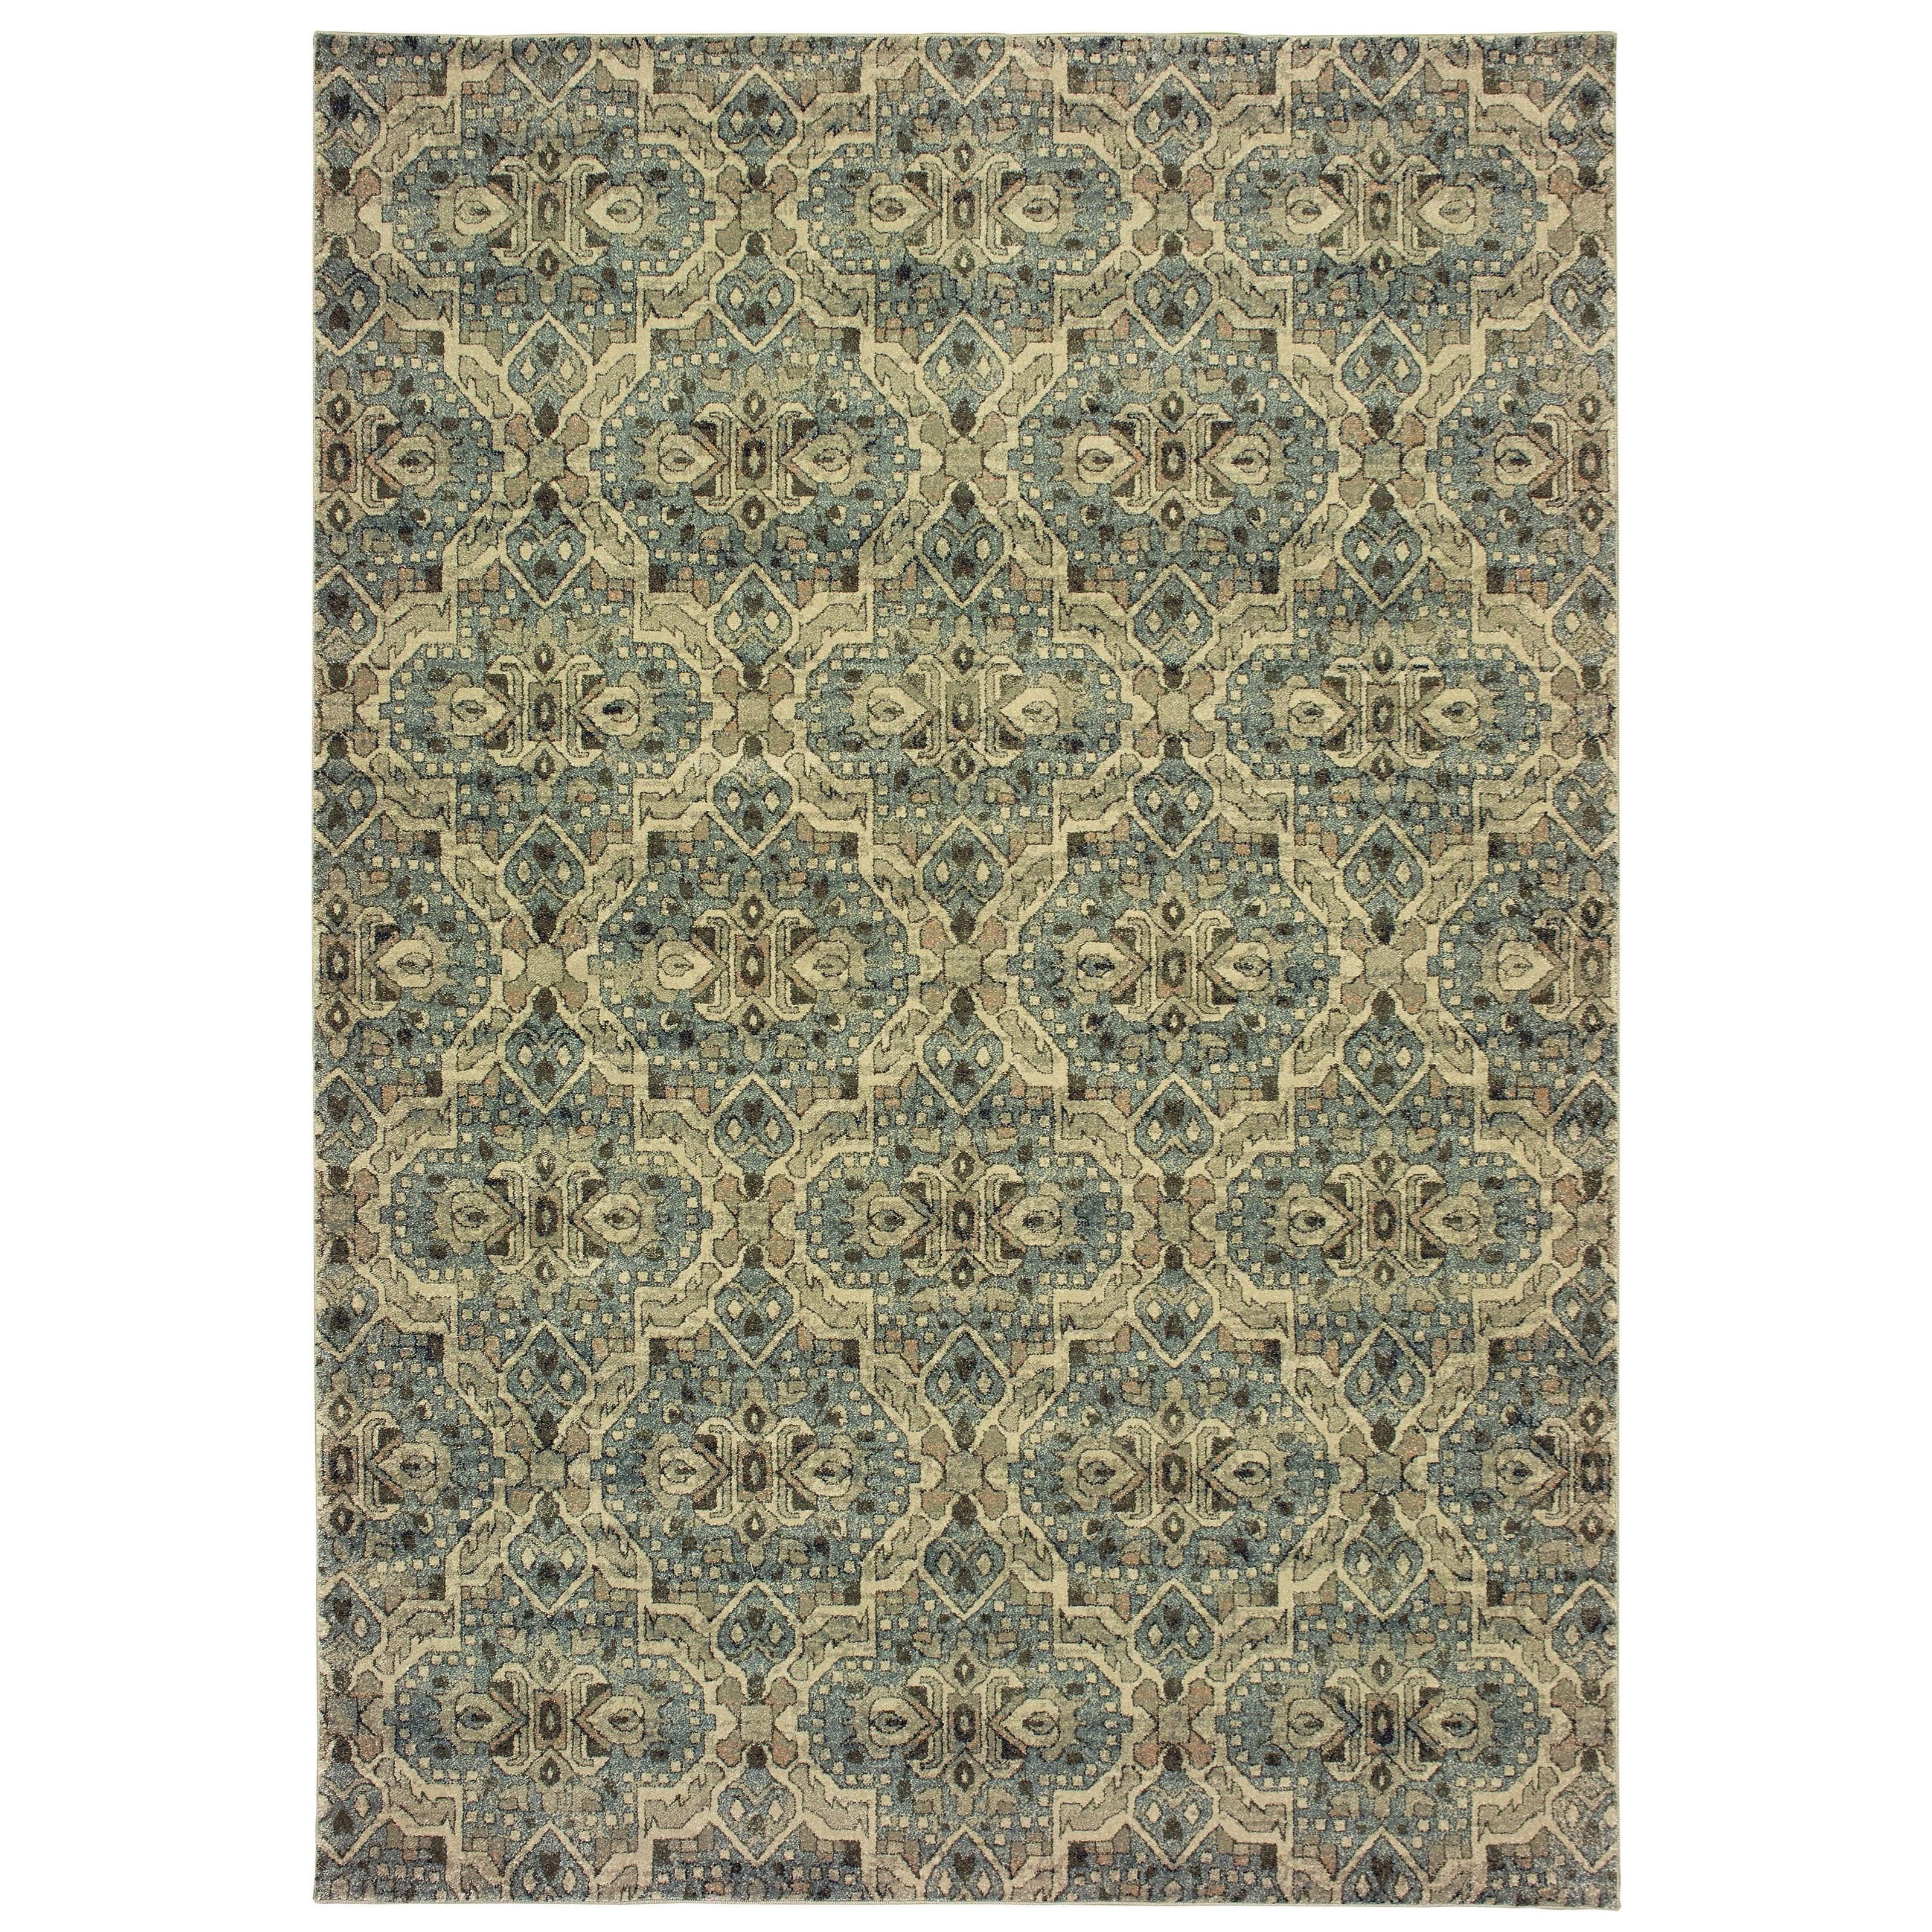 "Raleigh 5' 3"" X 7' 6"" Rug by Oriental Weavers at HomeWorld Furniture"